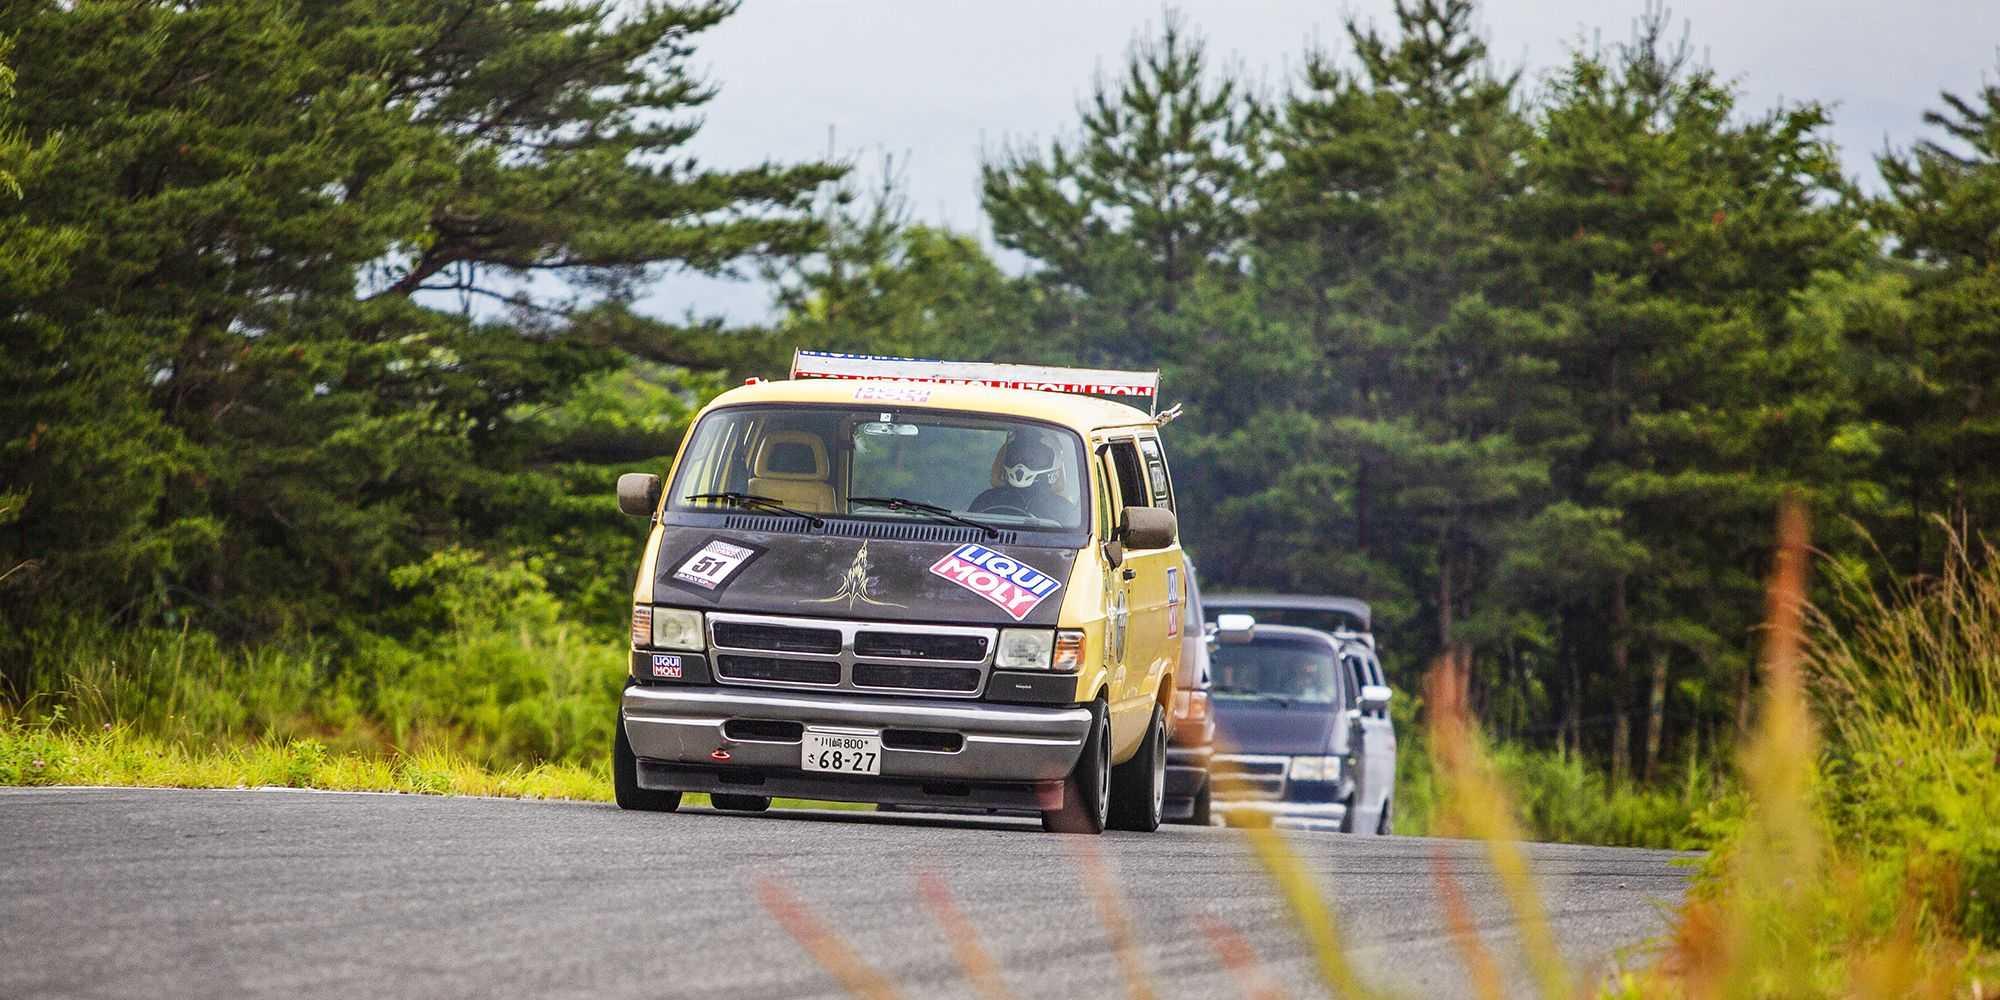 Dajiban: The Japanese Dodge Van Culture